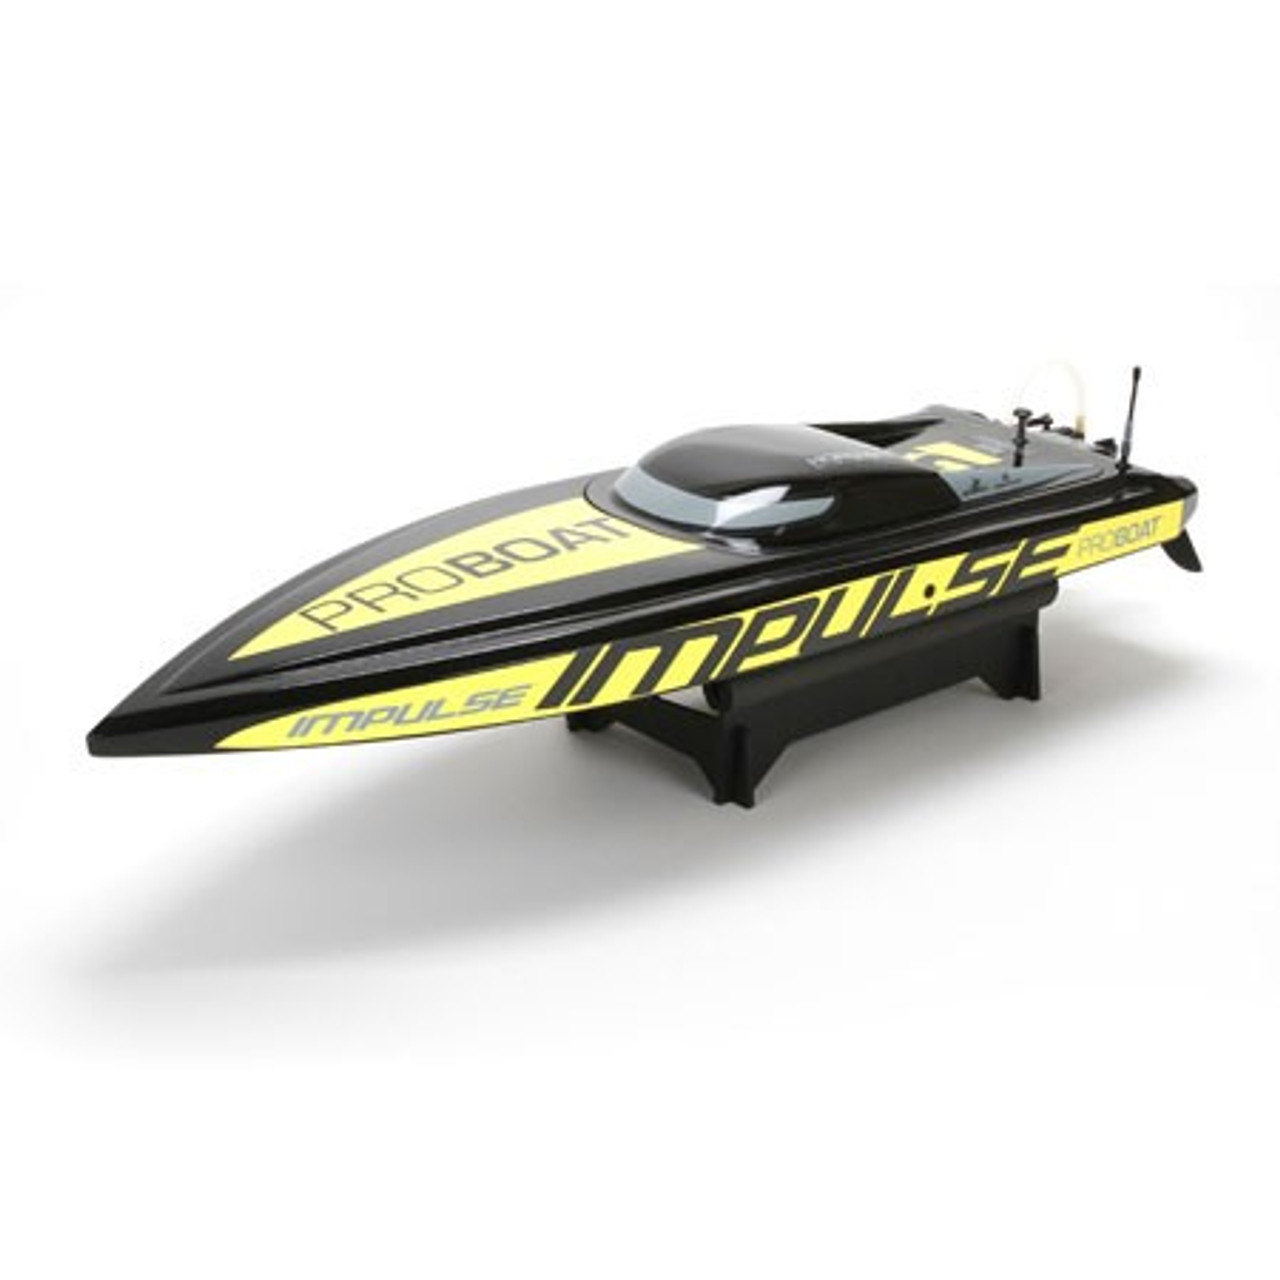 Pro Boat Impulse 31 Inch Deep V RC Boat, RTR